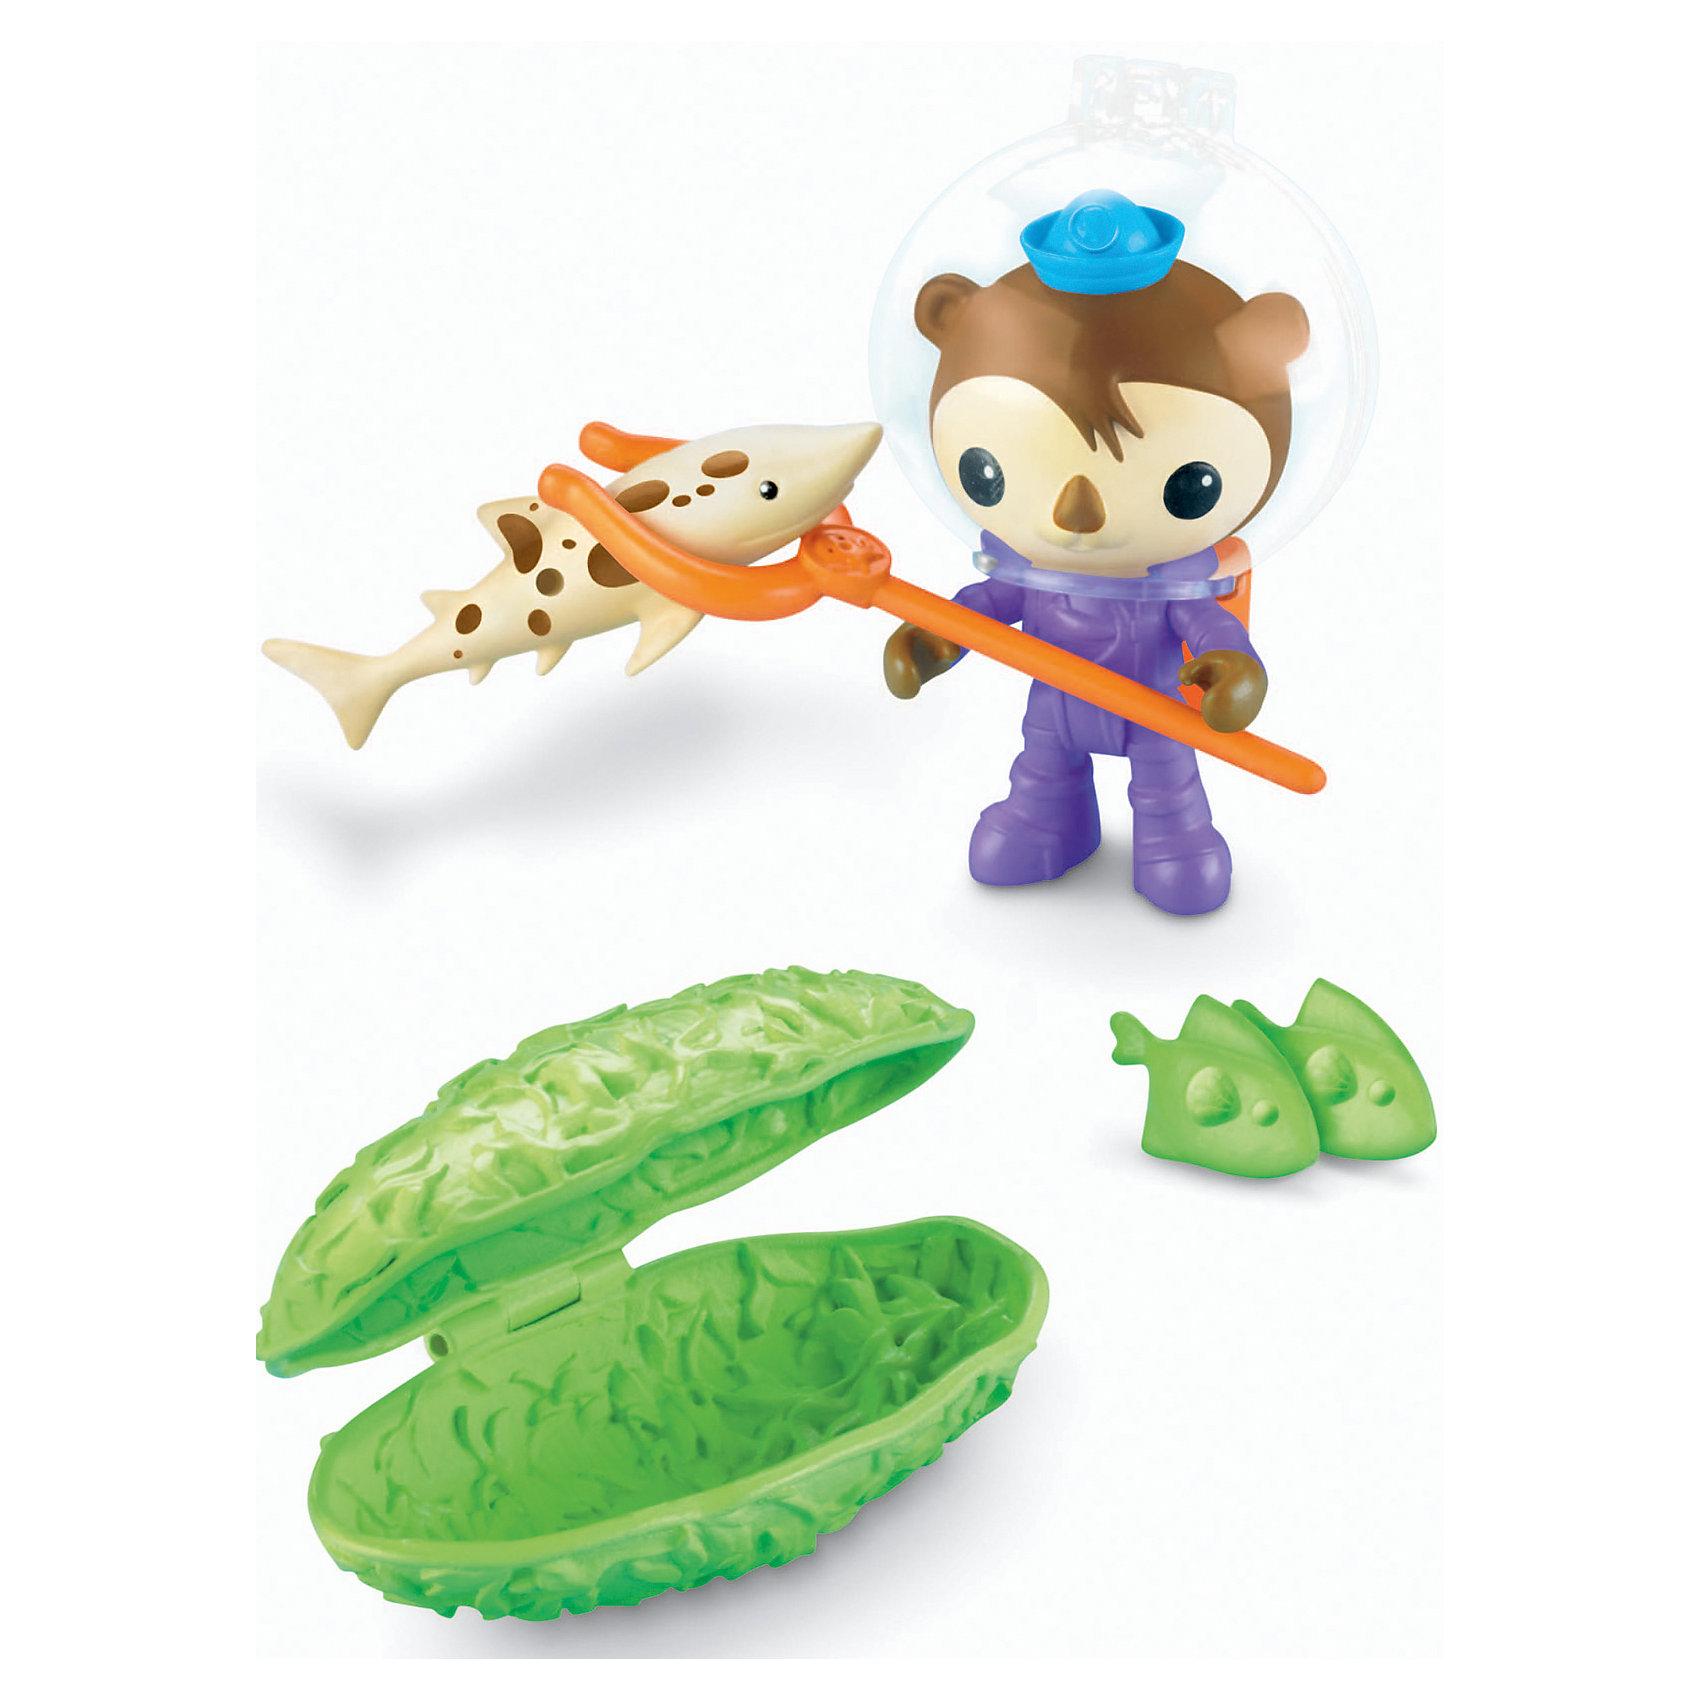 Mattel Набор фигурок с транспортом, Октонавты, Fisher Price mattel базовая фигурка октонавты fisher price